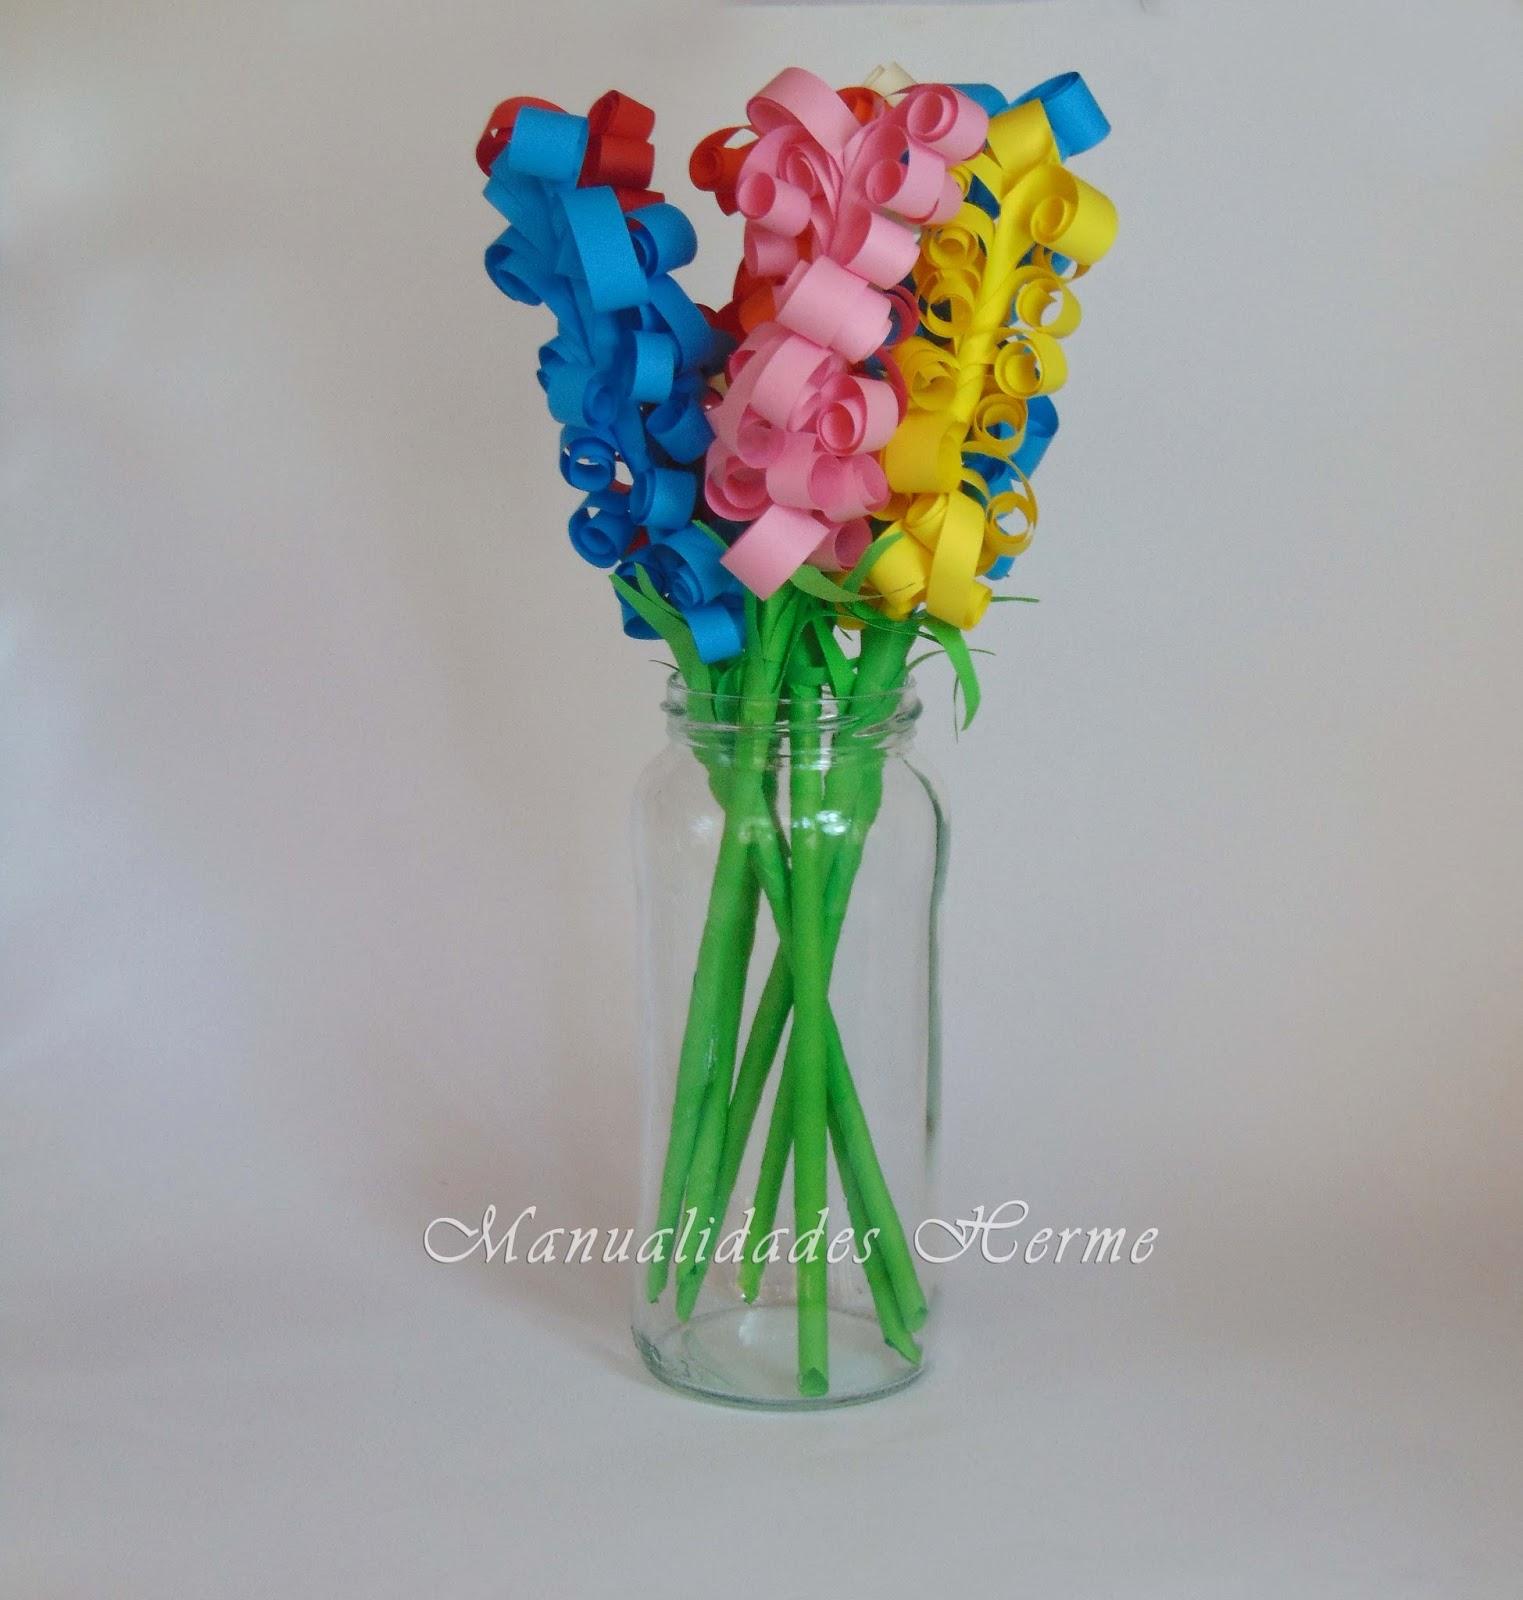 Manualidades herme como hacer flores de papel jacintos - Manualidades con papel de colores ...